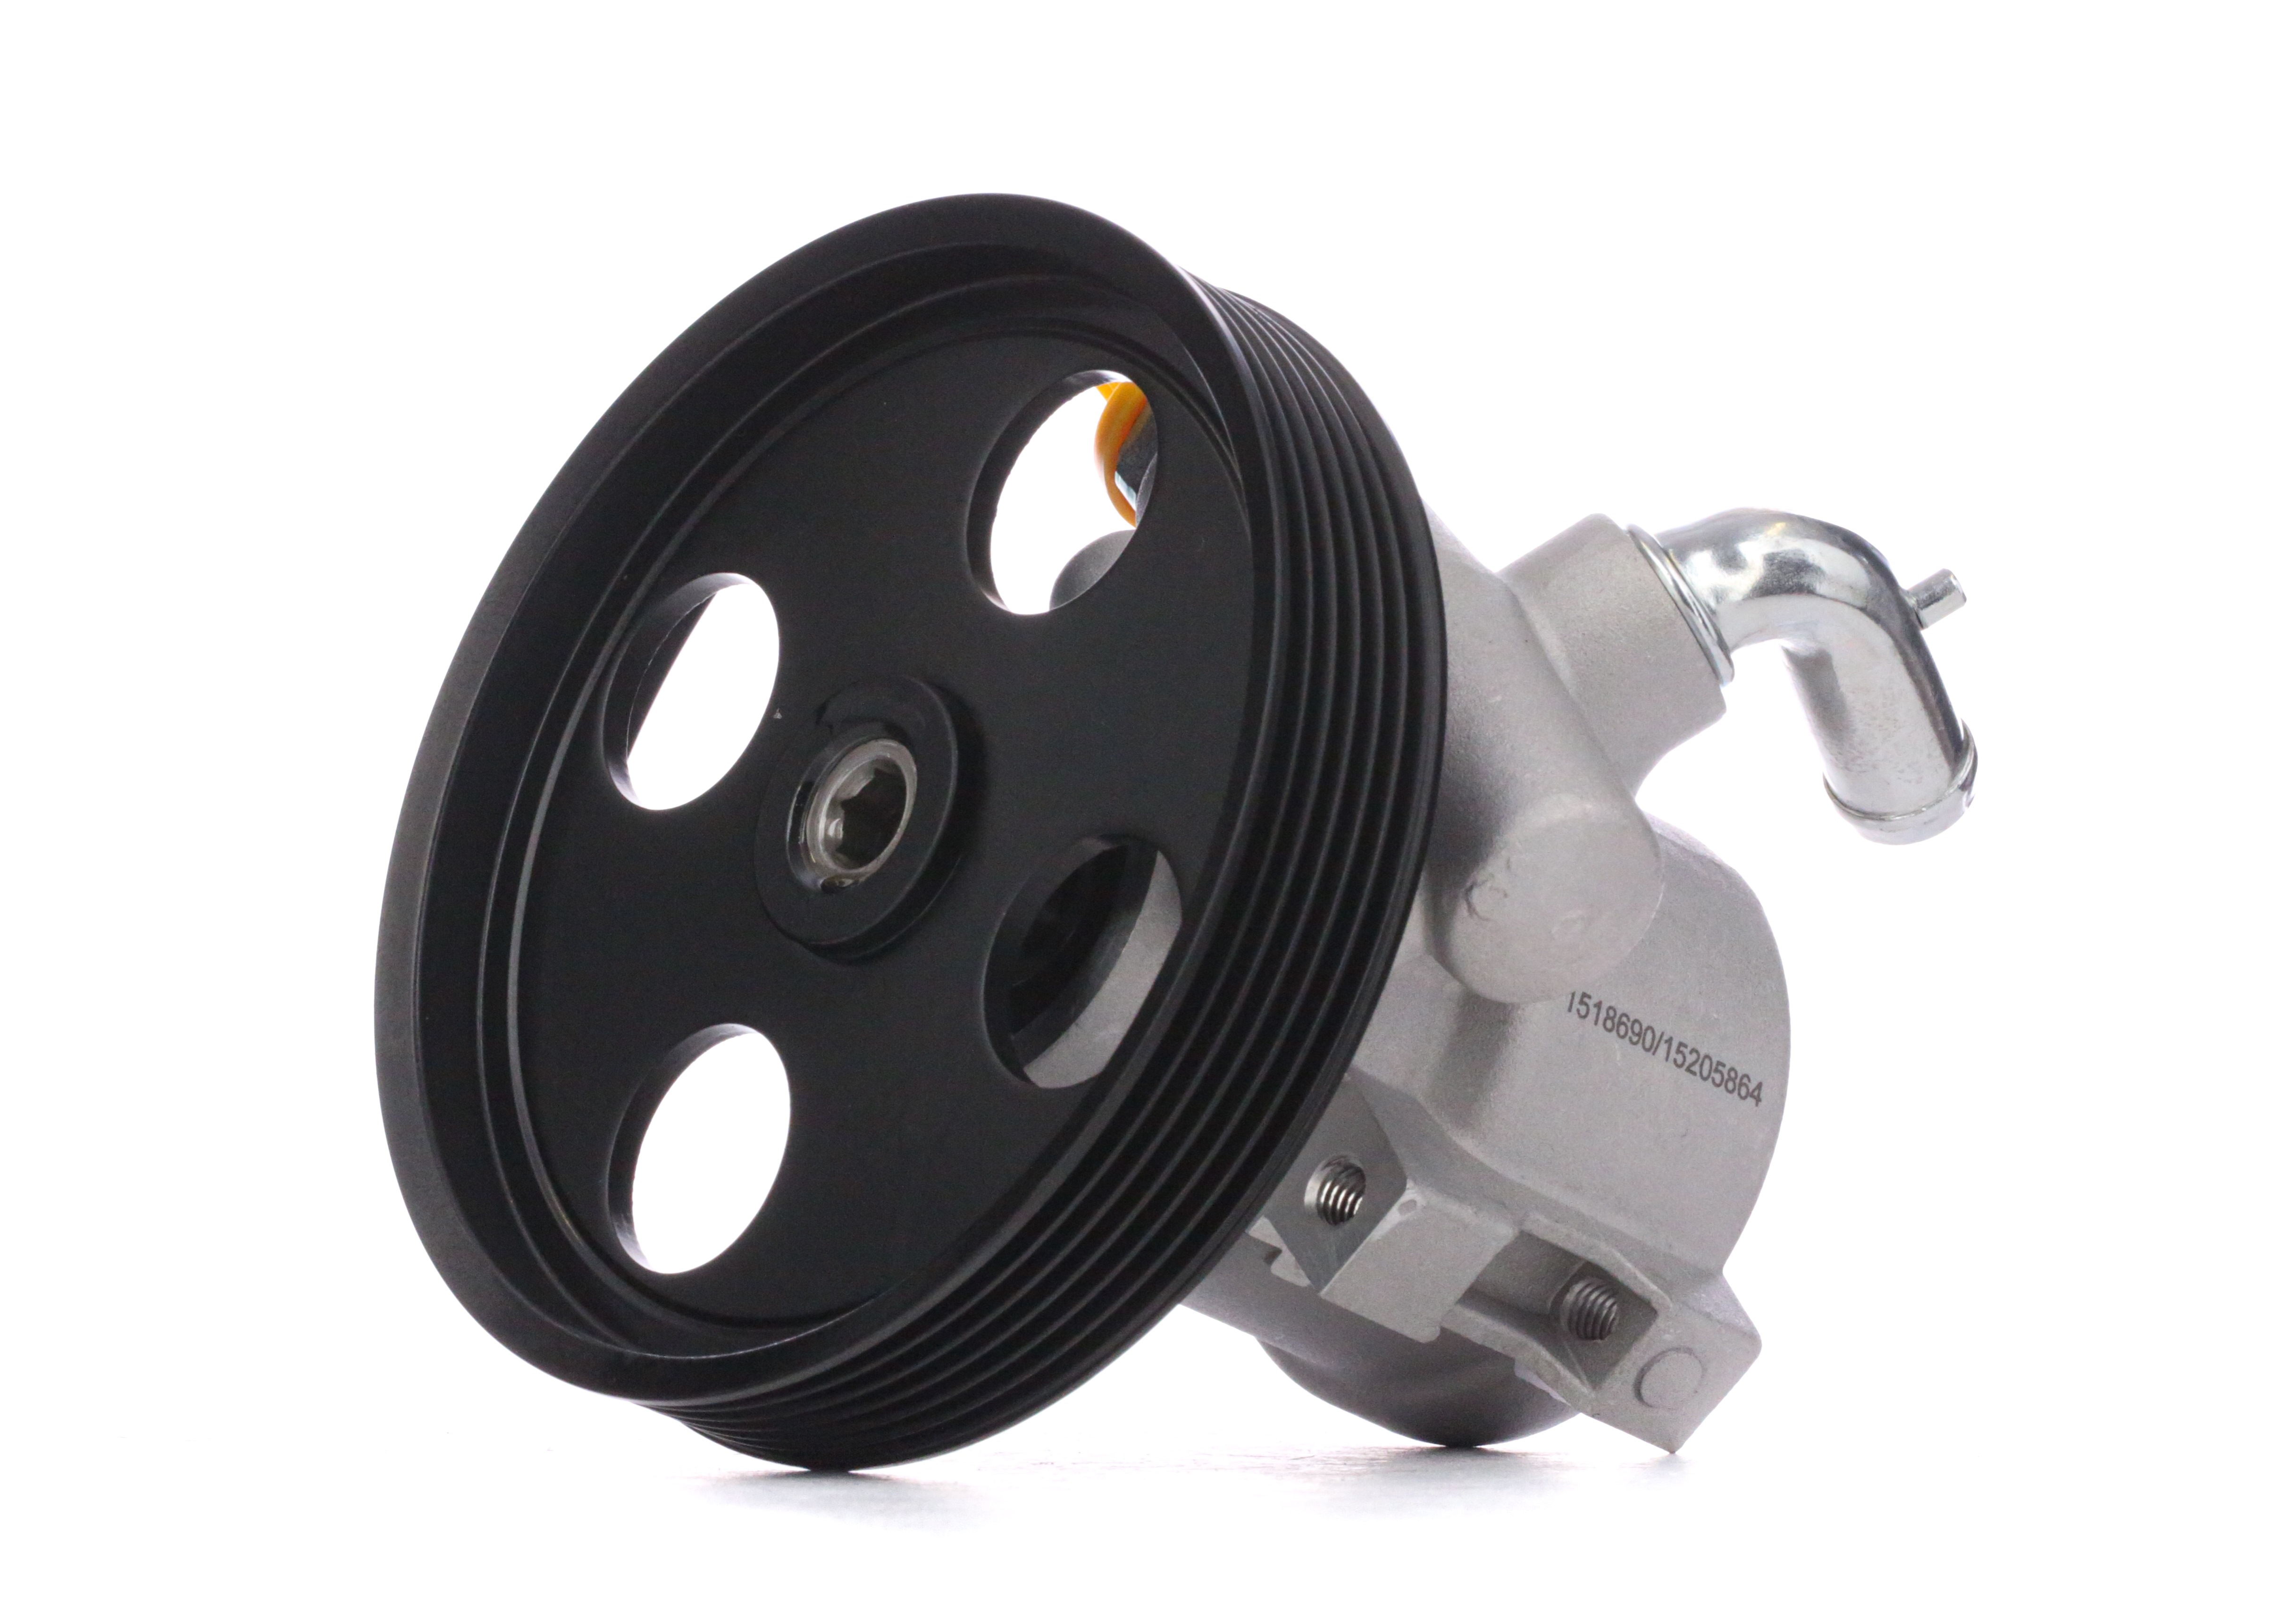 Origine Pompe hydraulique RIDEX 12H0203 (Pression [bar]: 80bar, Véhicule avec direction à gauche ou à droite: pour direction à droite/à gauche)